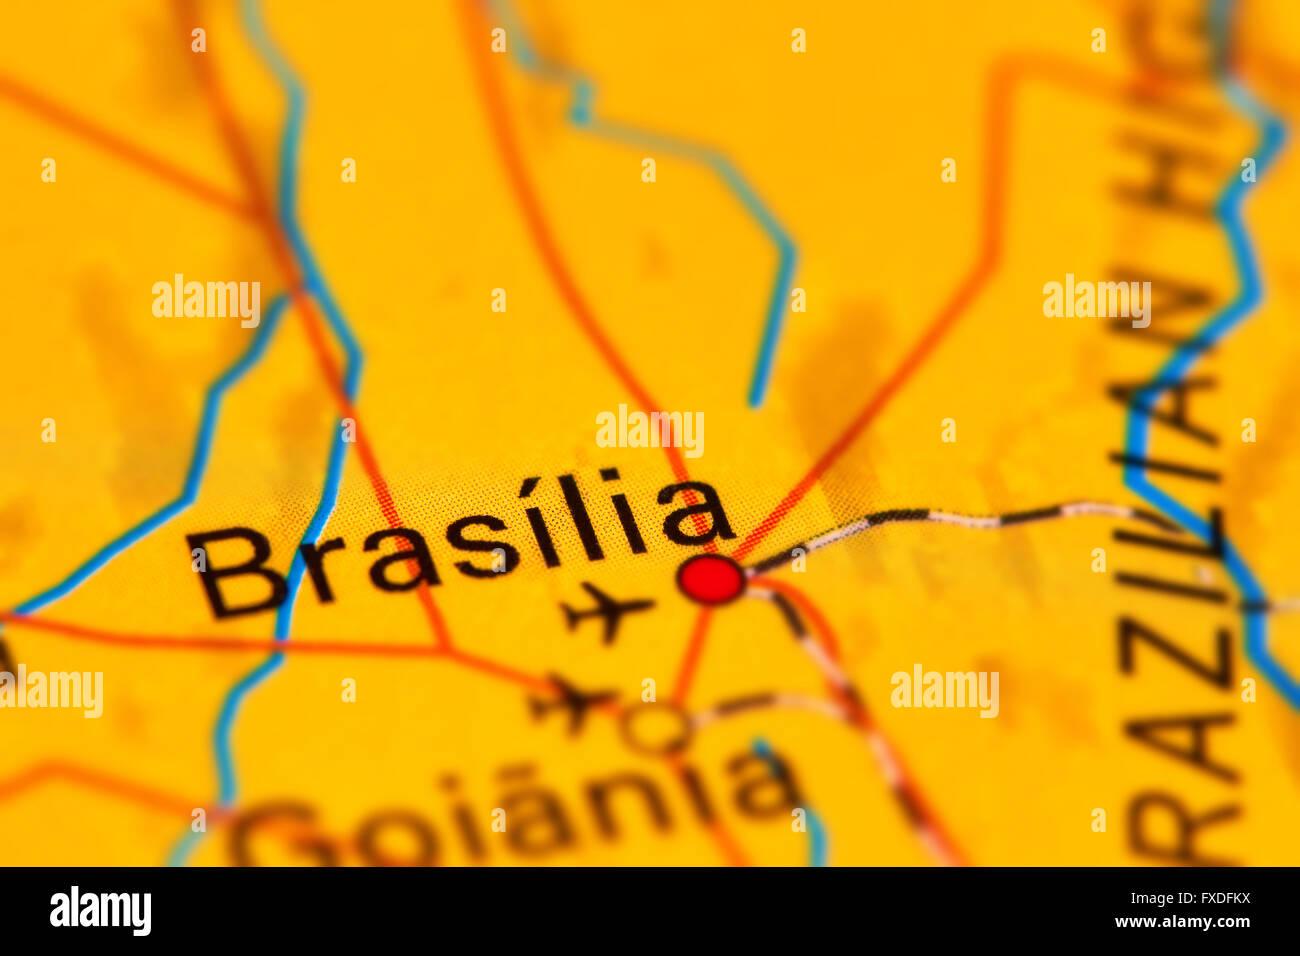 Brasilia Capital City Of Brazil On The World Map Stock Photo